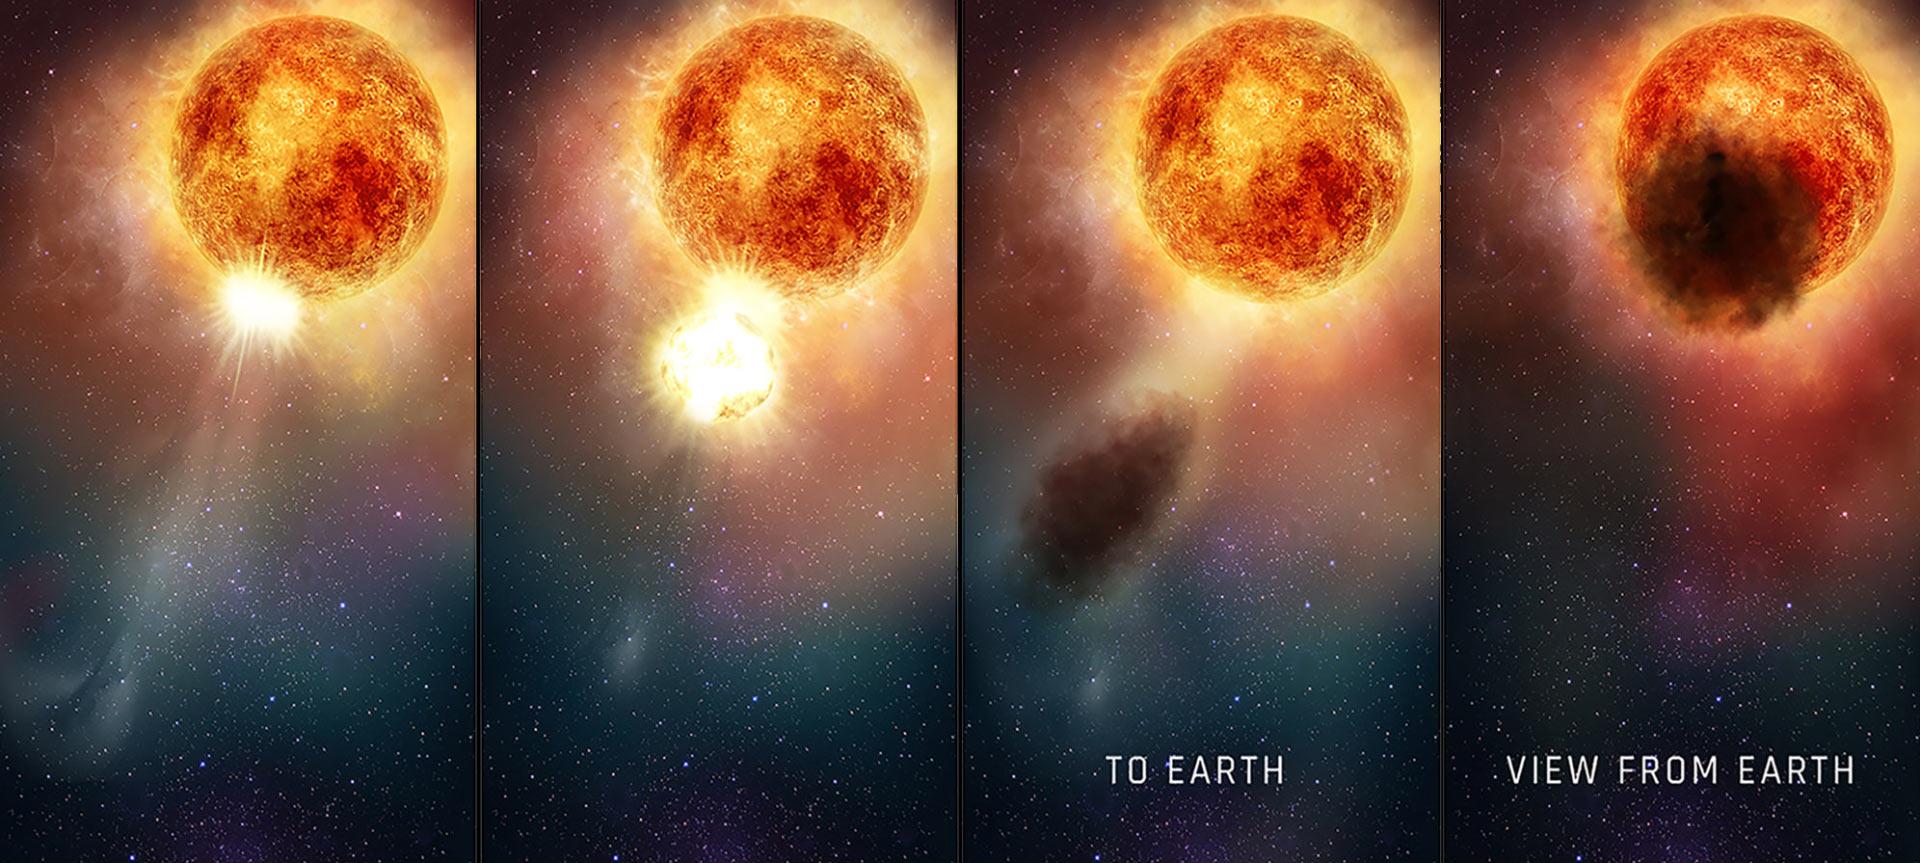 image e Betelgeuse